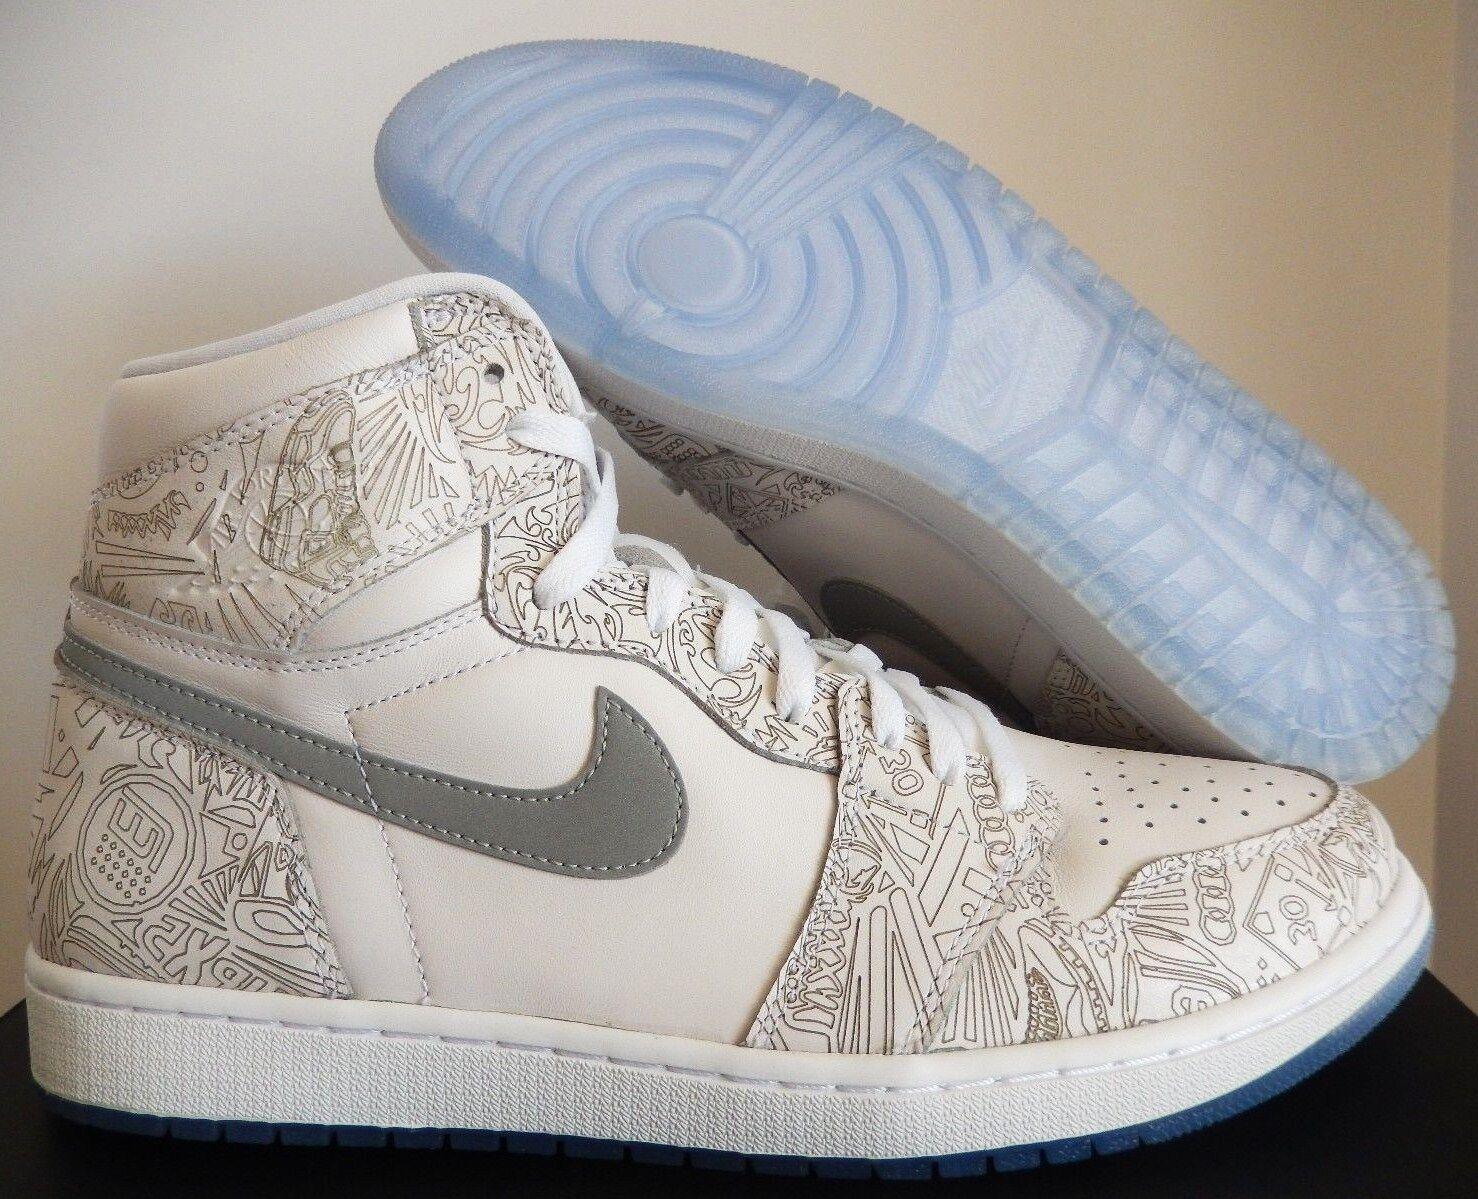 Nike Air Jordan 1 Láser Retro Alta OG Láser 1 Blanco-Plata Metalizado [705289-100] 3adb0b